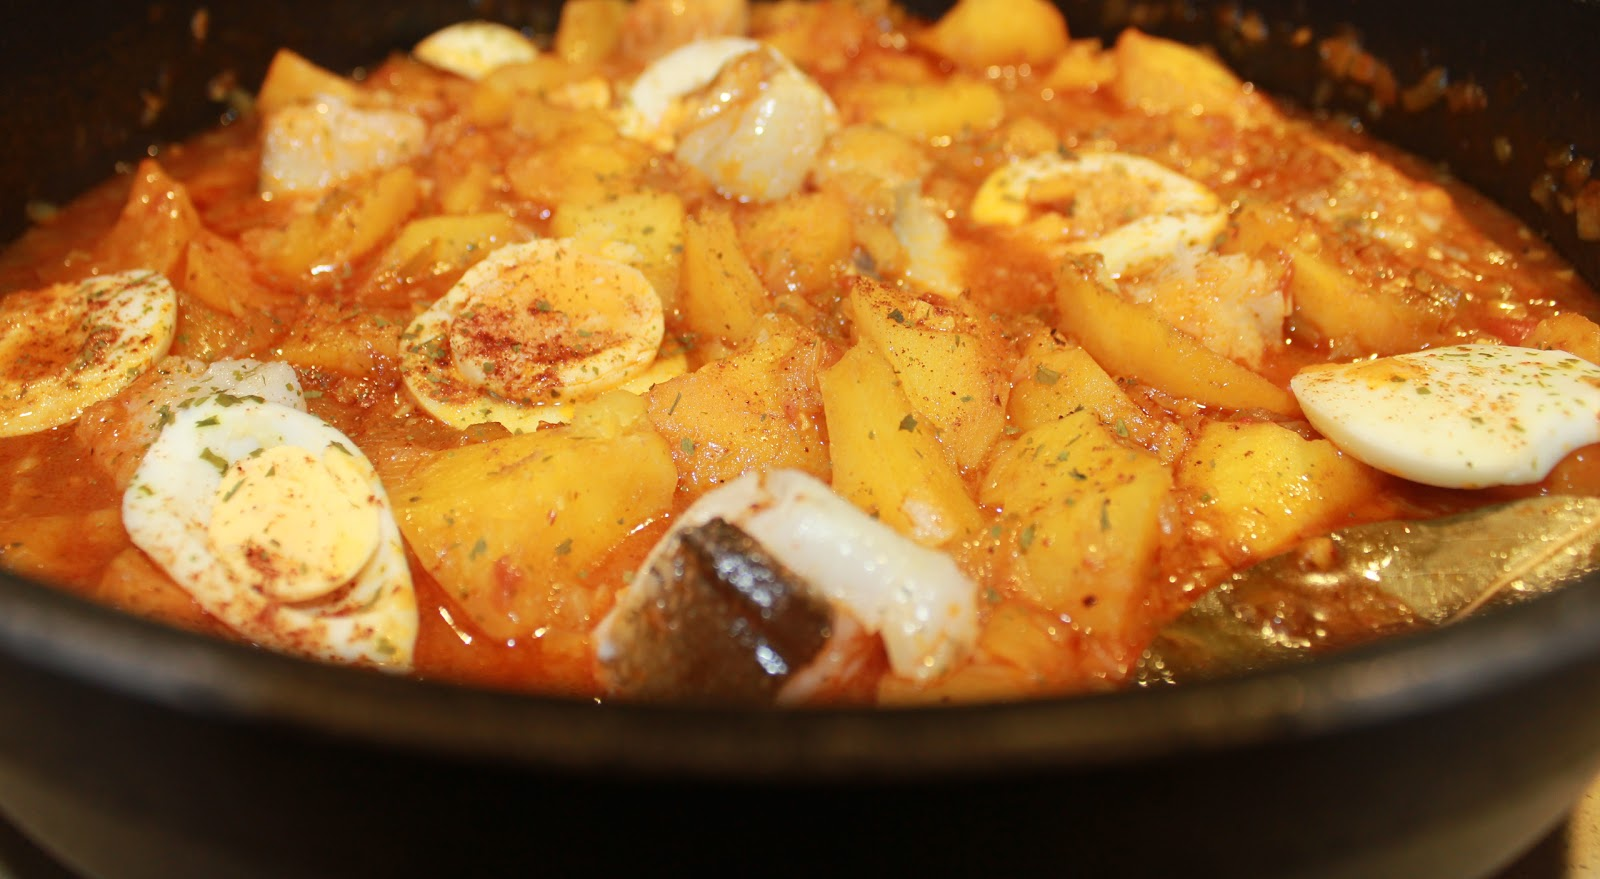 Mi puchero papas con bacalao o como donde comen 2 comen 3 - Bacalao con garbanzos y patatas ...